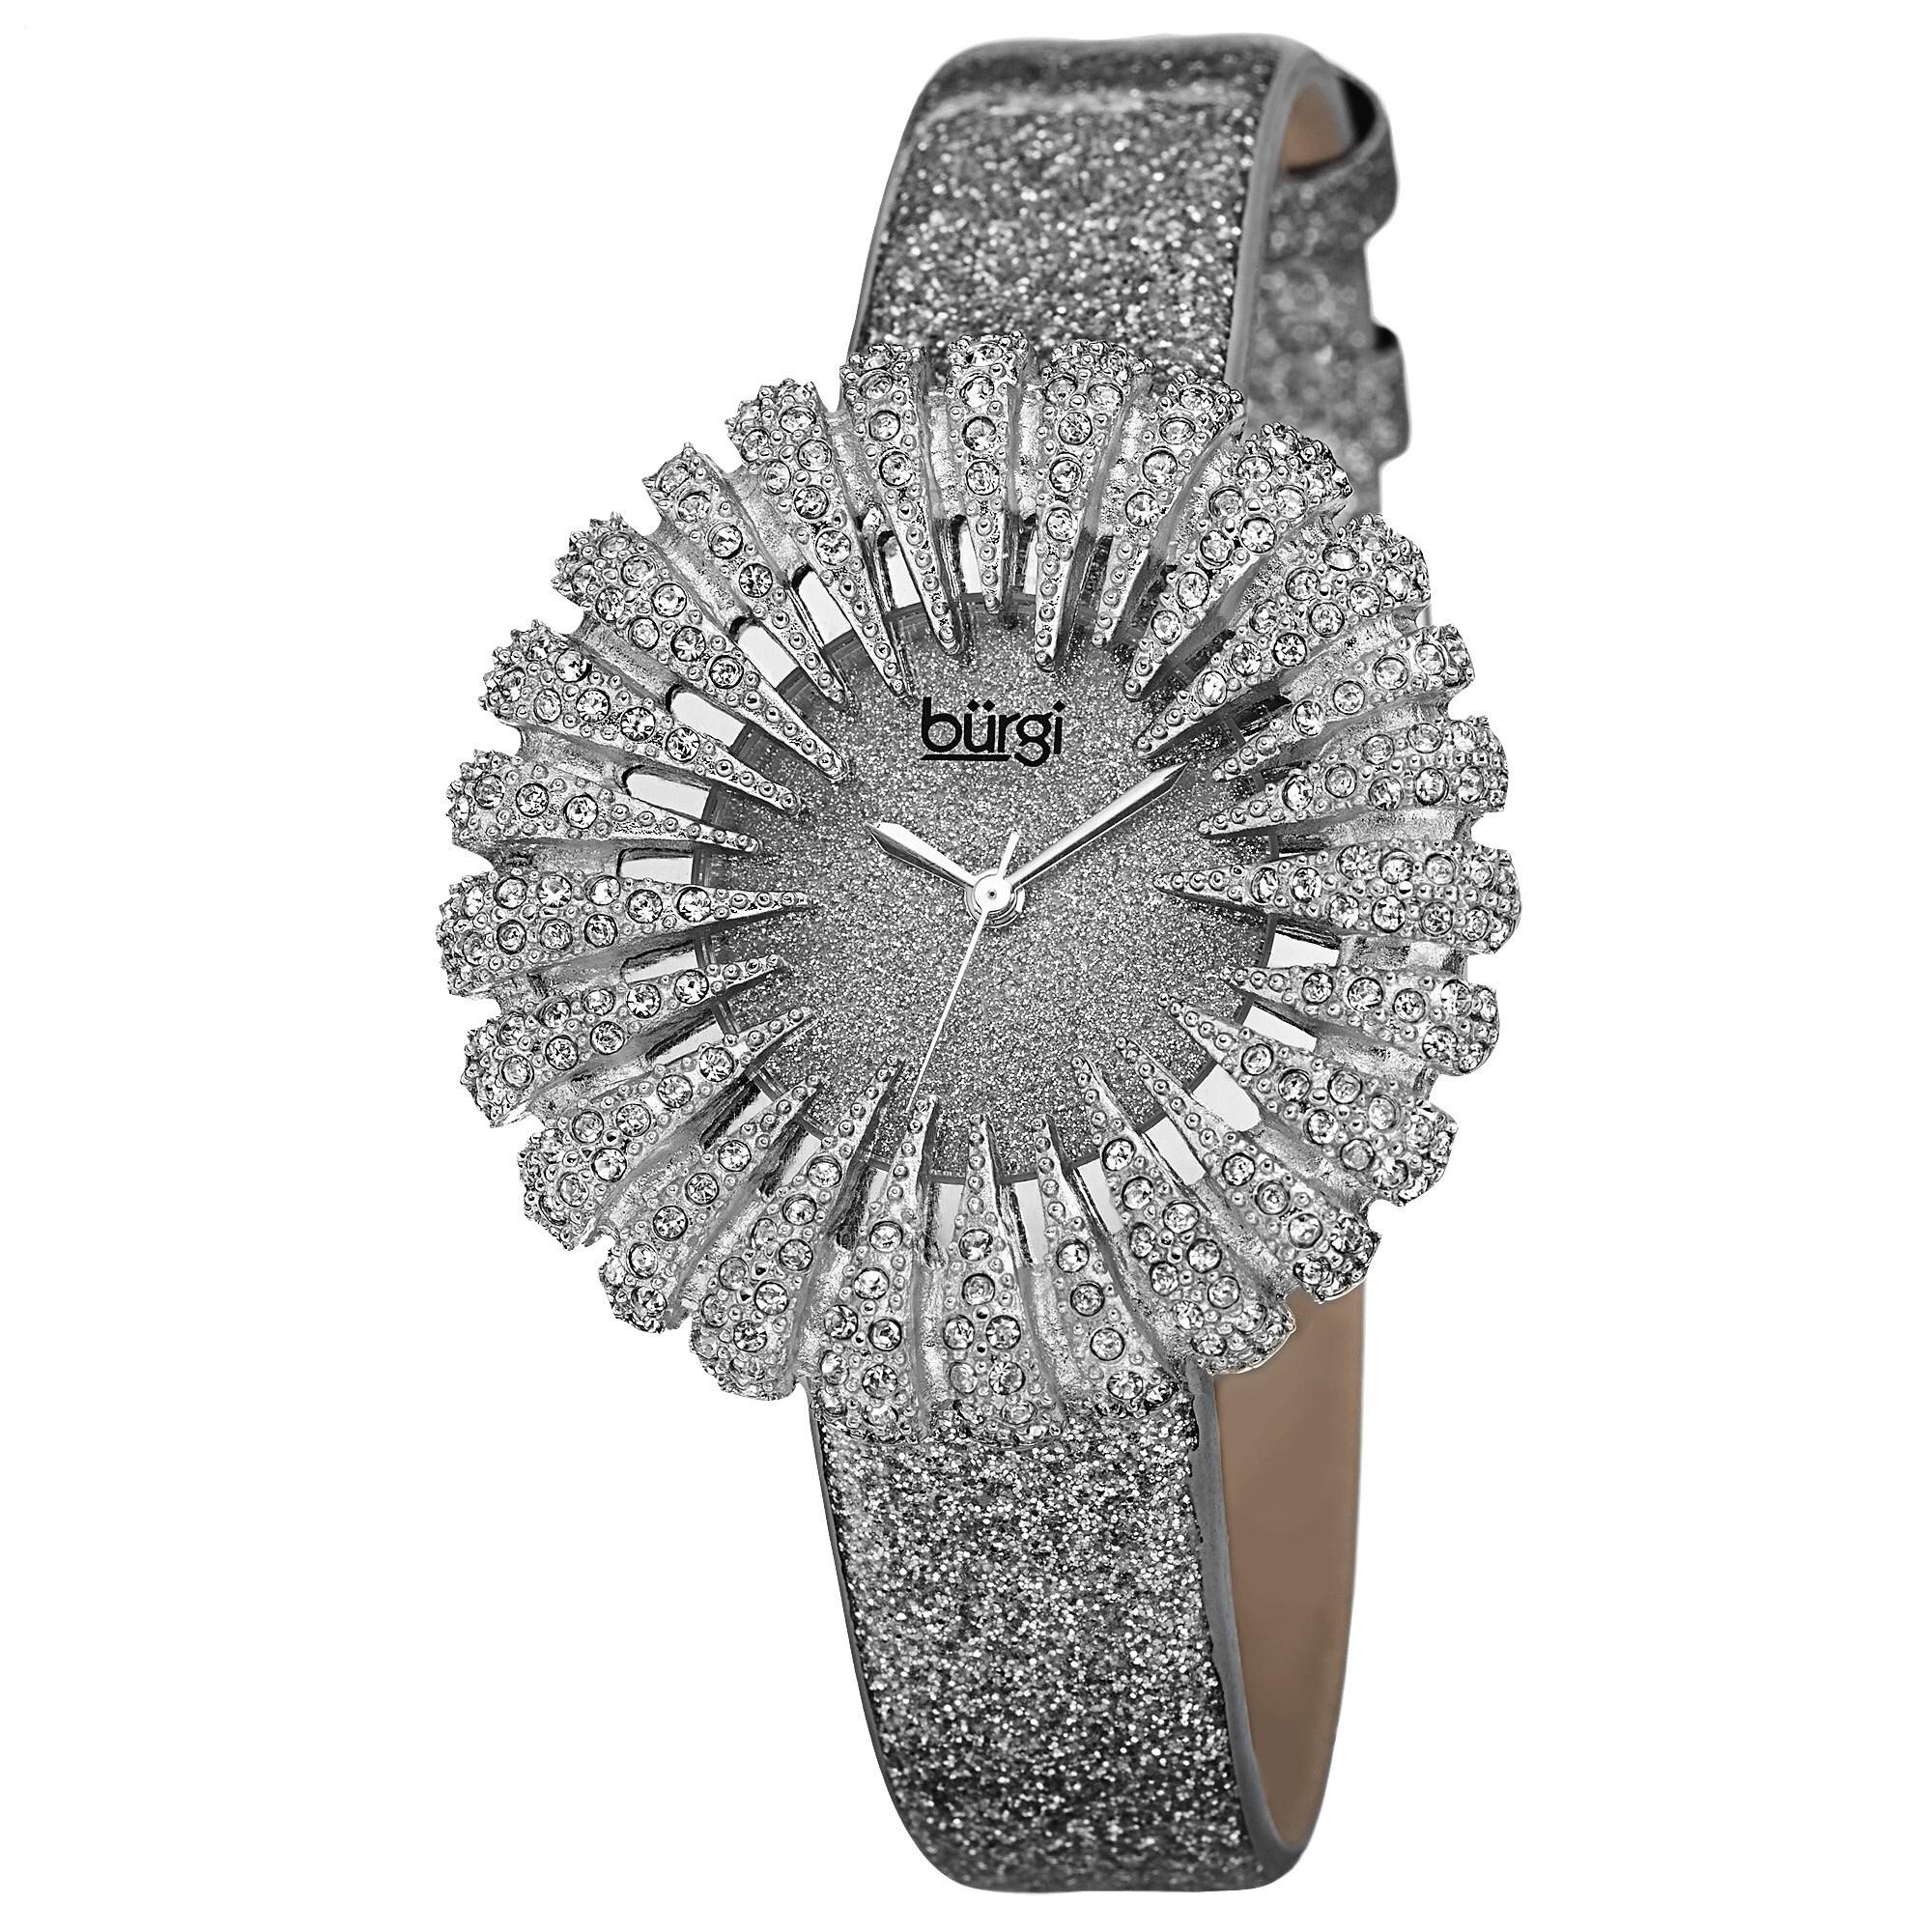 Burgi Women's Holiday-Style Quartz Sparkling Leather Grey...